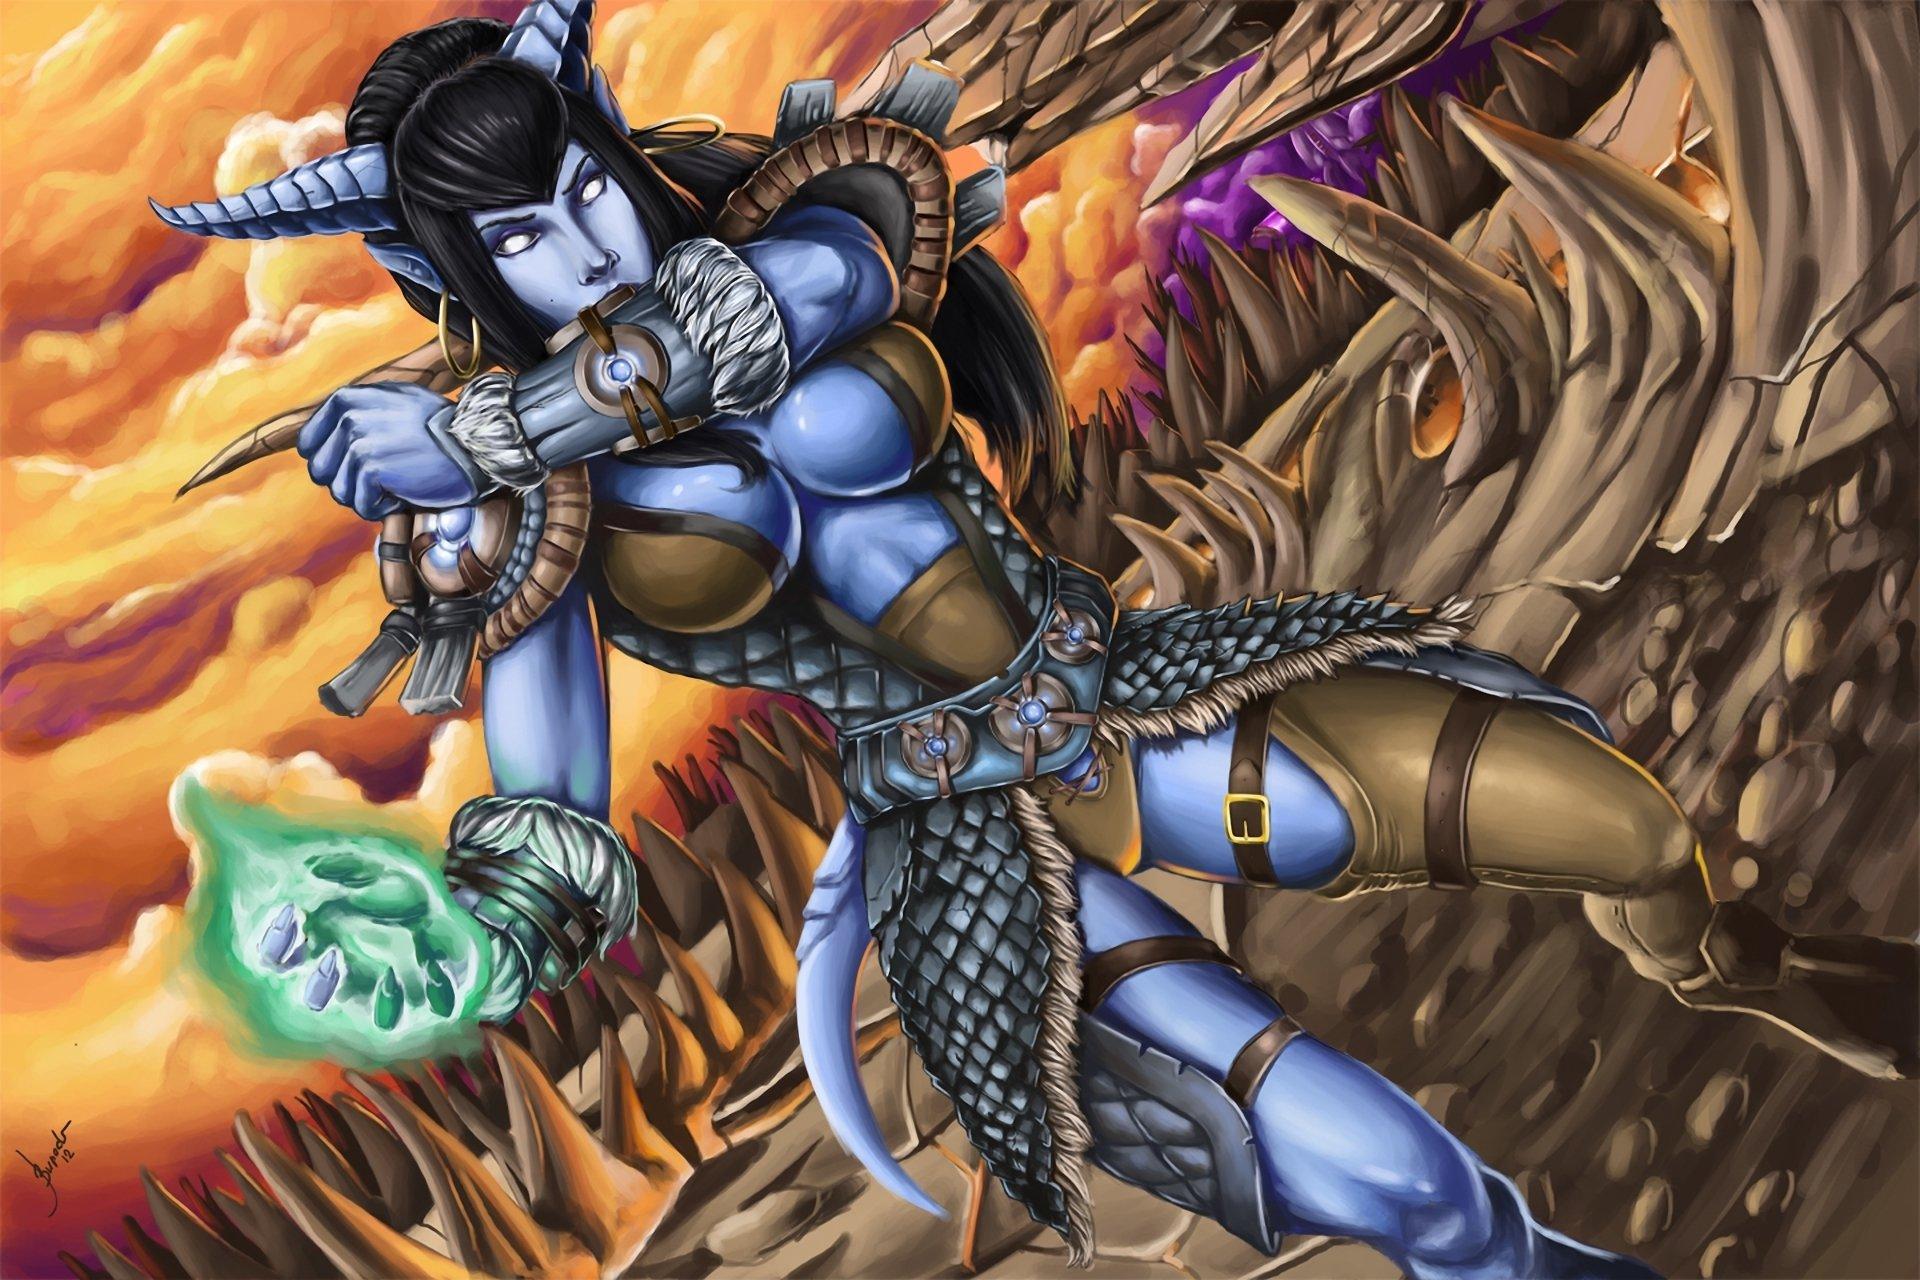 of WarCraft WoW Magic Warrior Horns Games Girls Fantasy wallpaper 1920x1280